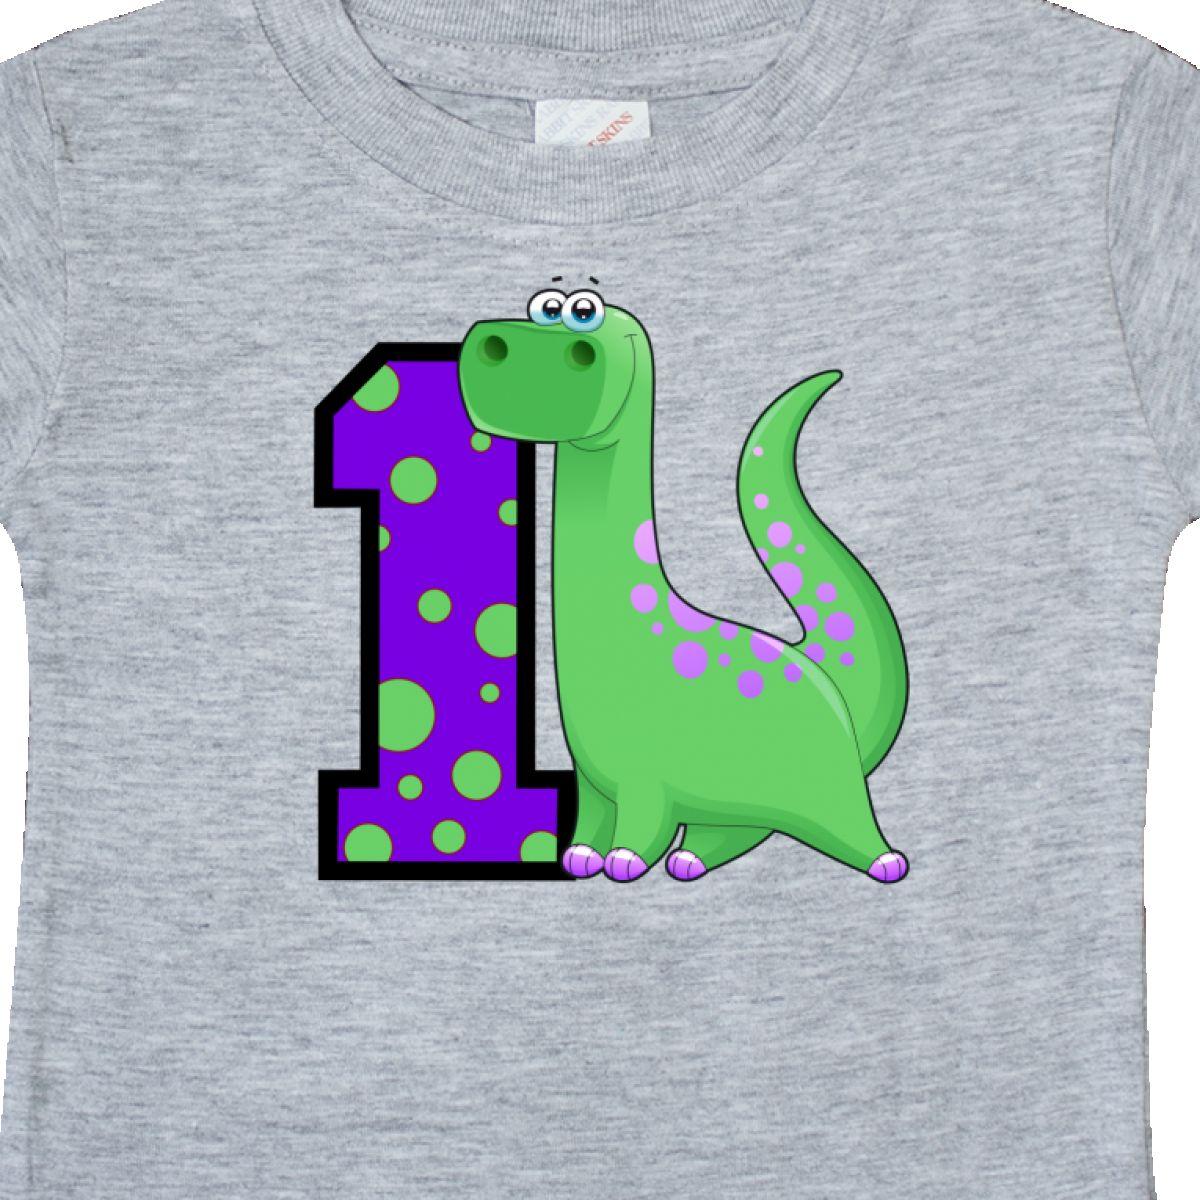 Inktastic Dinosaur 1st Birthday Baby T Shirt 1